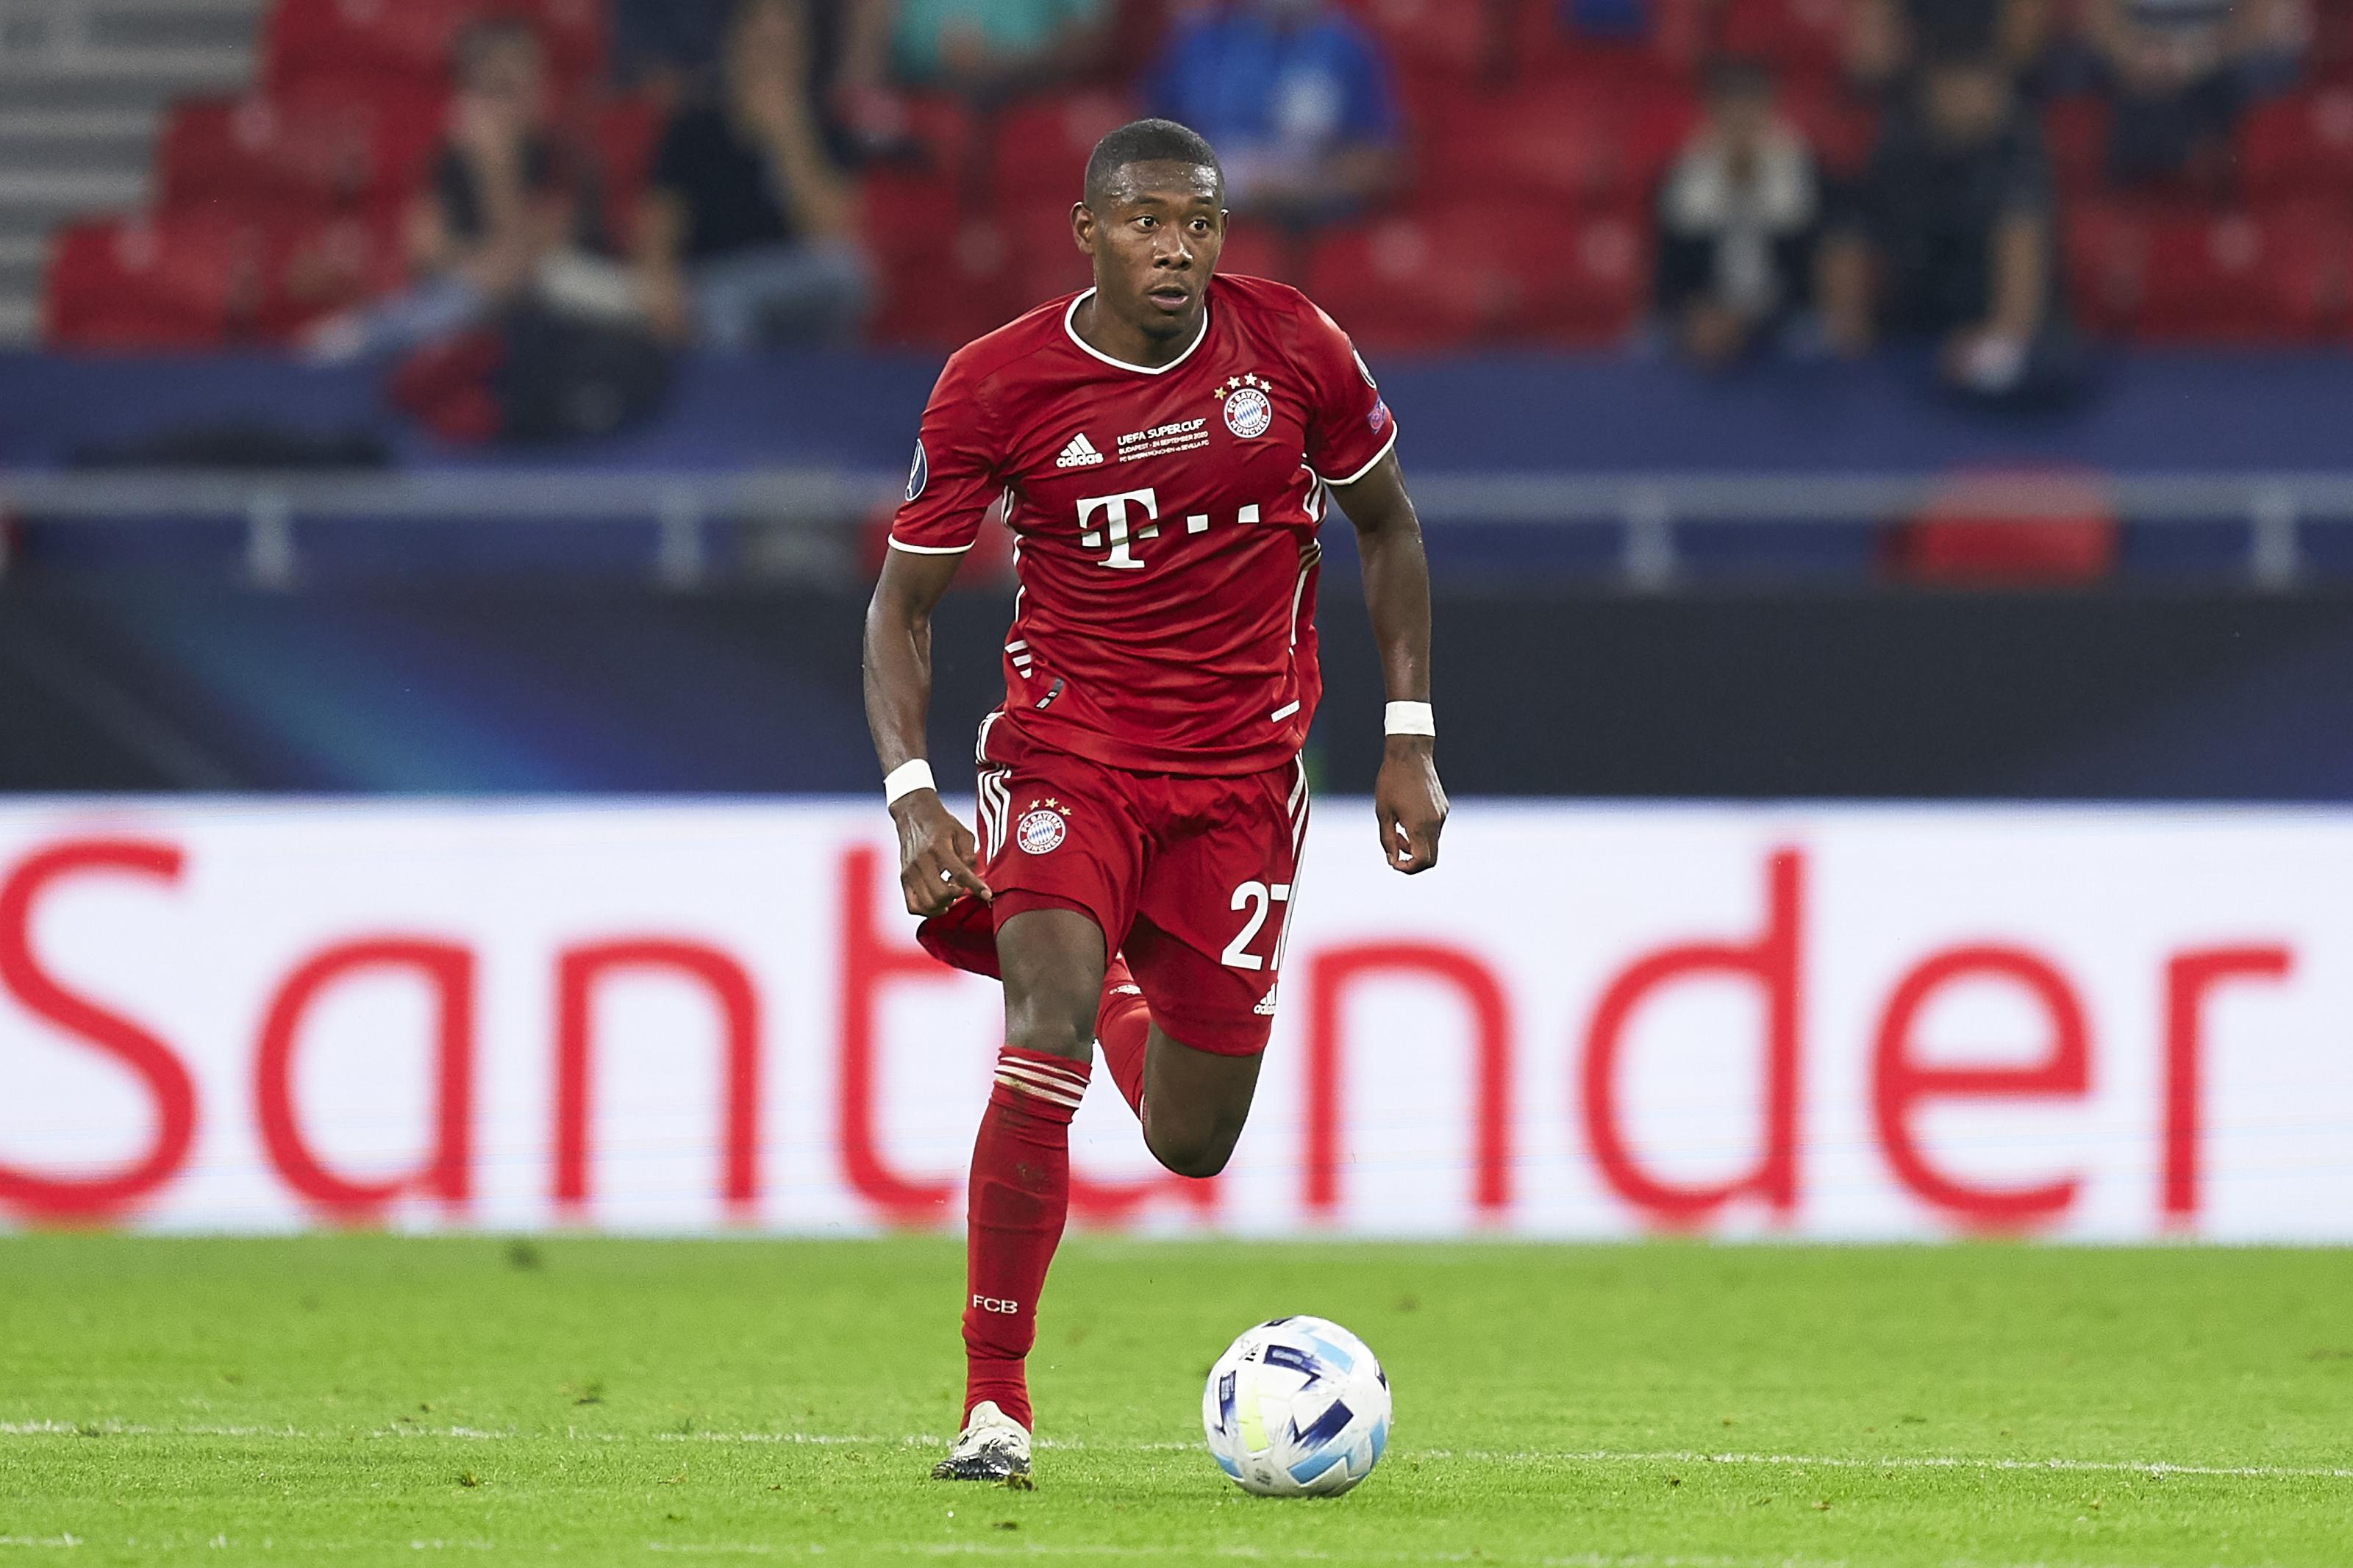 Bayern Munich will not break wage structure for David Alaba